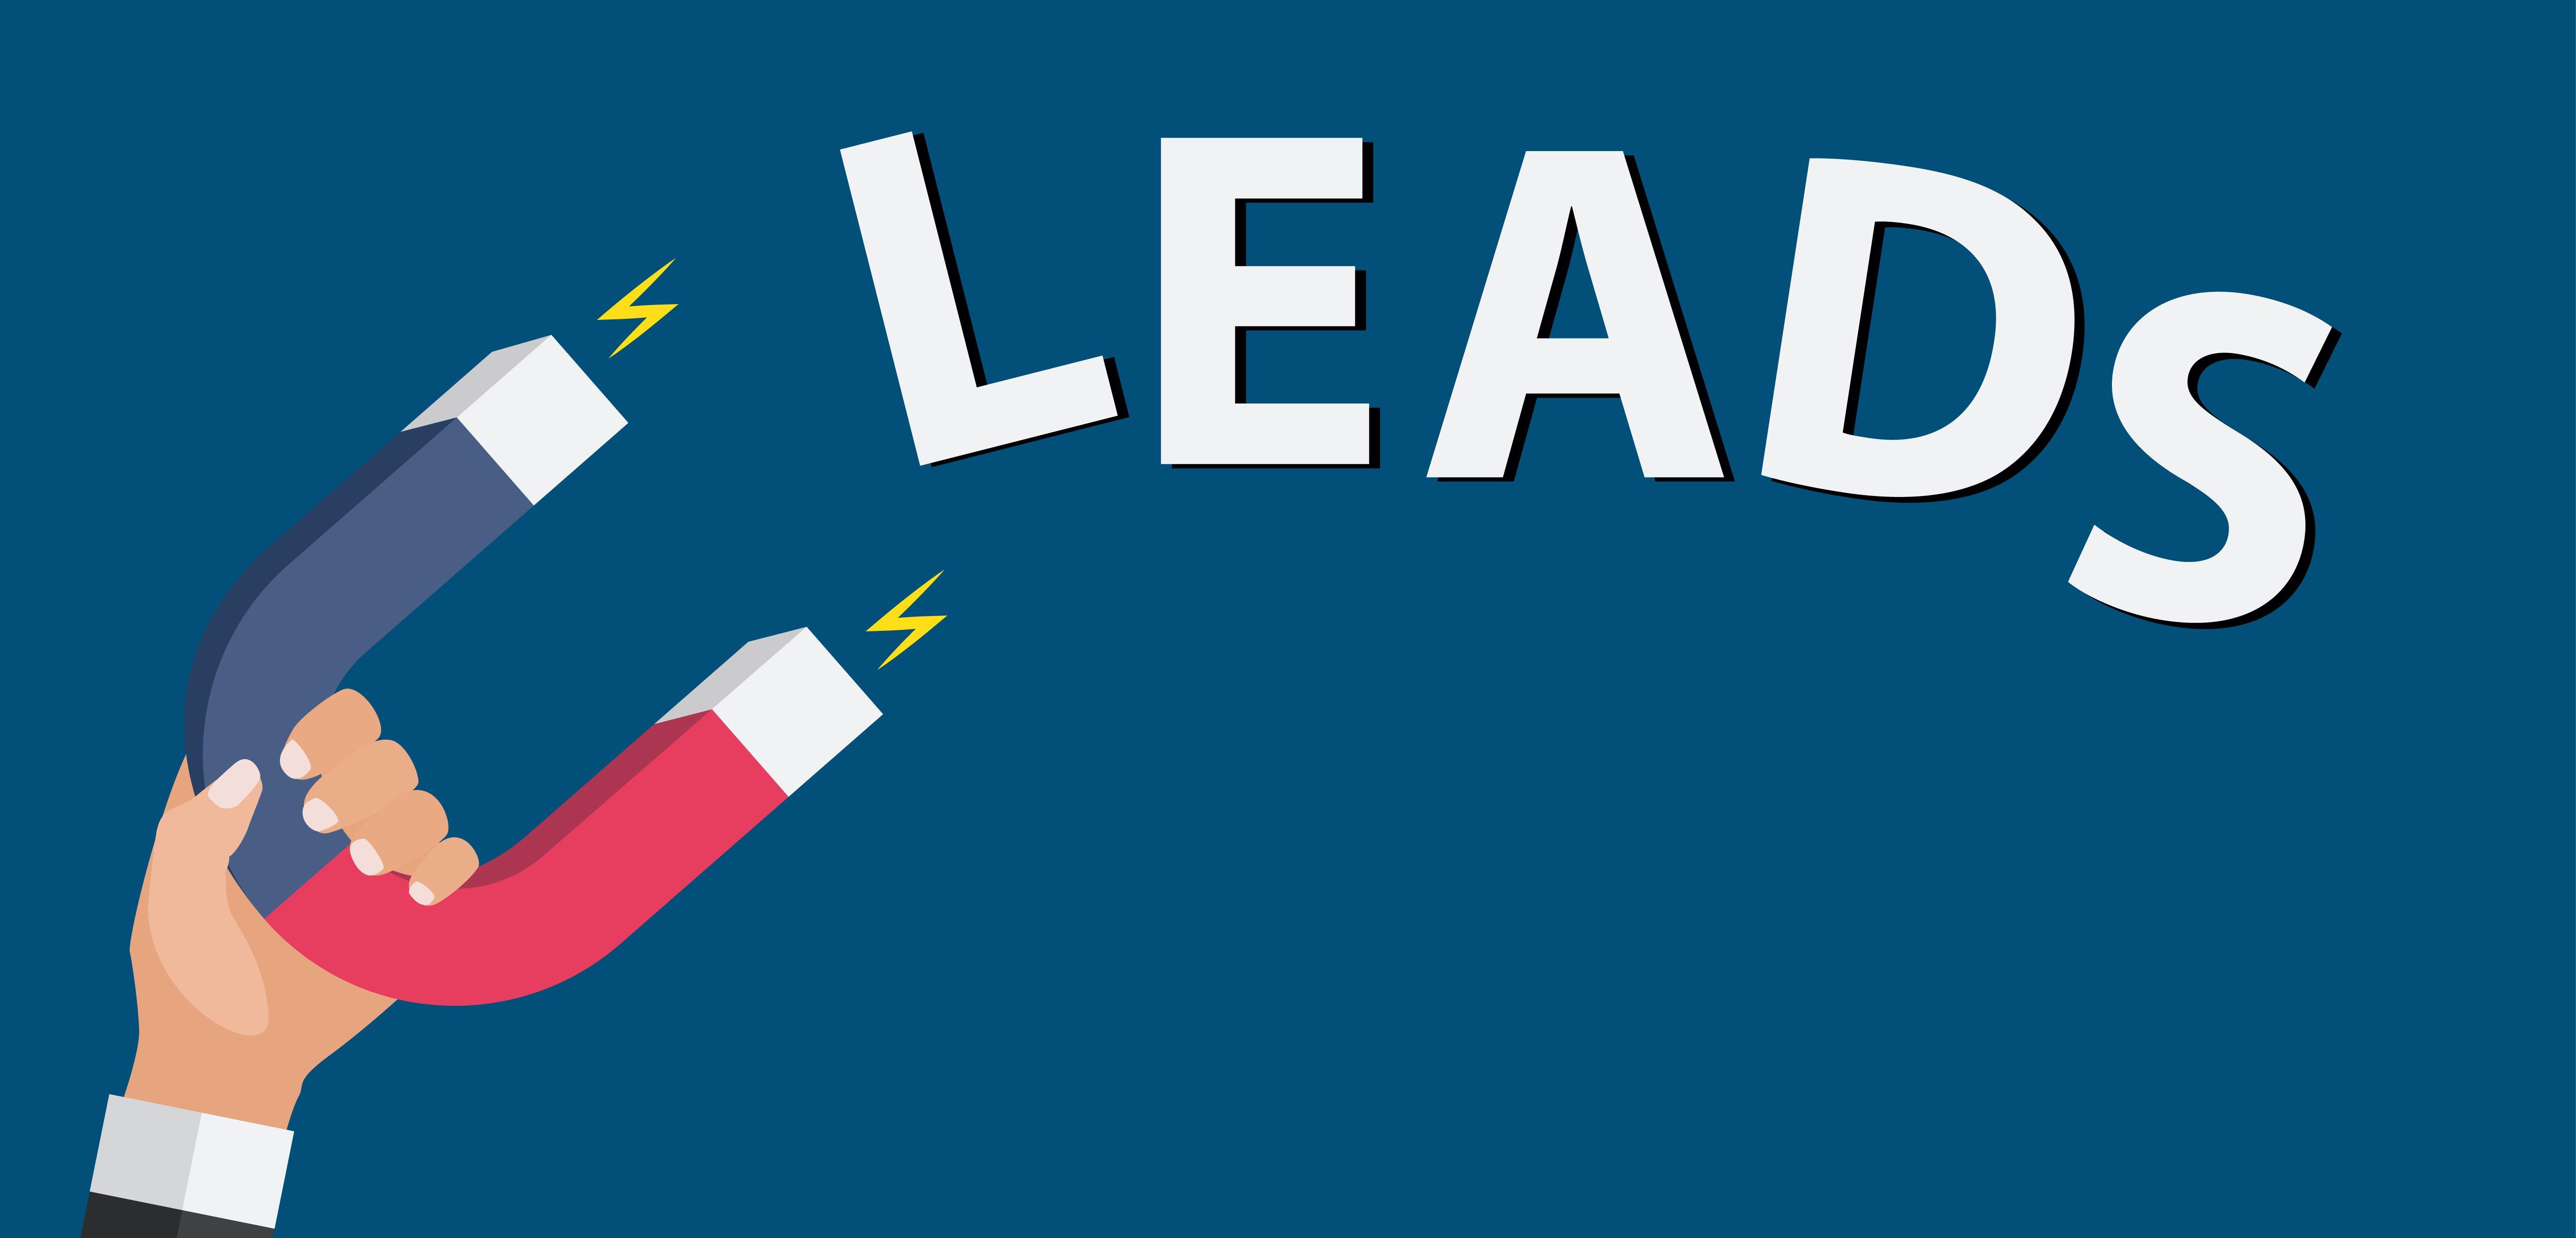 Leads Illustration